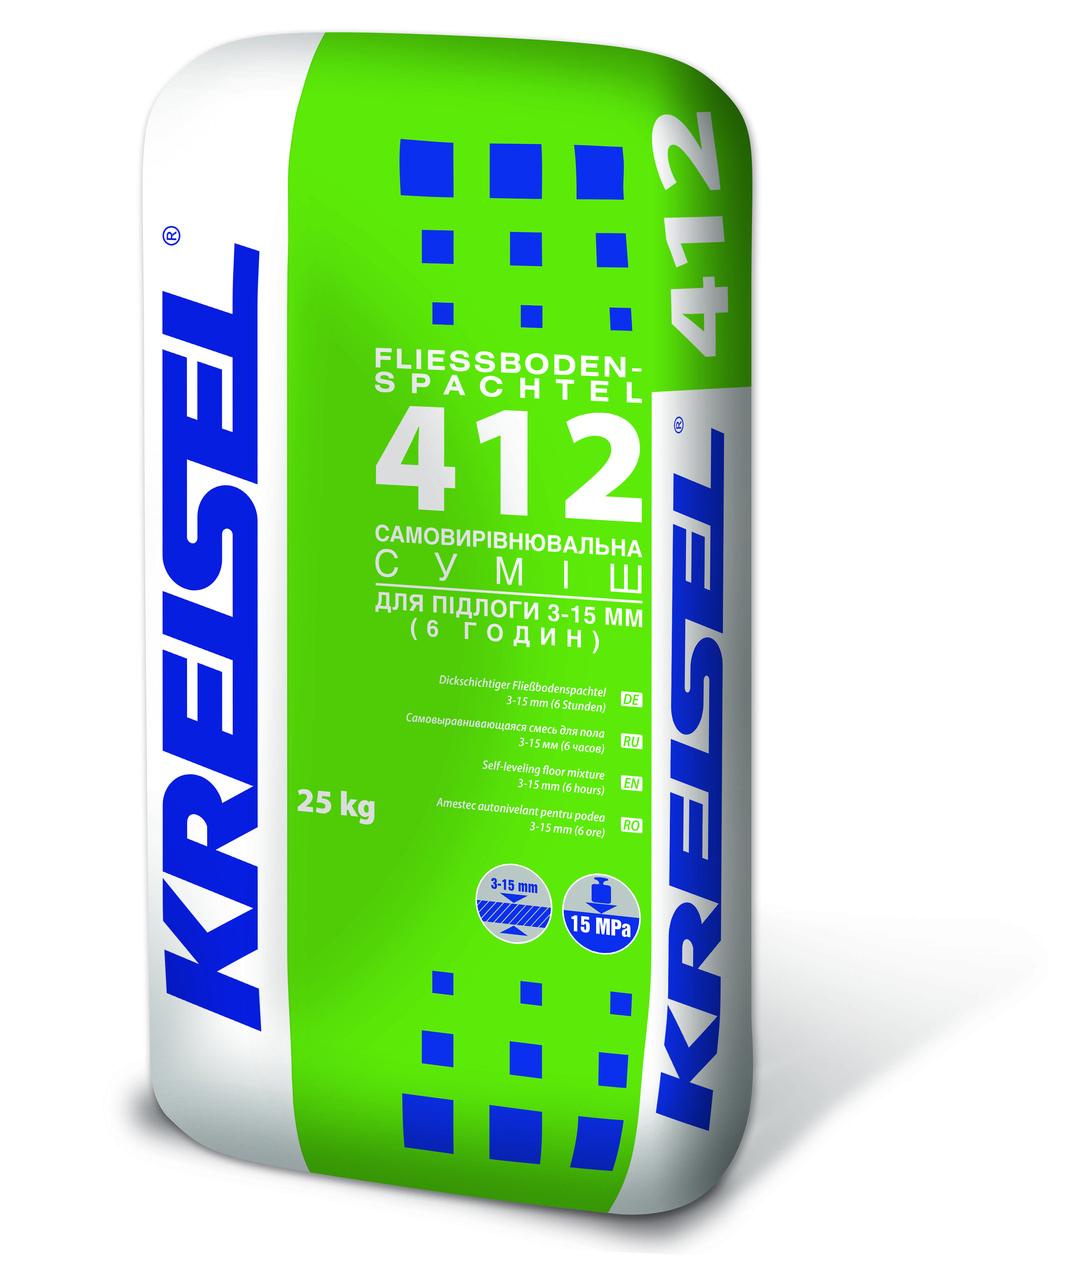 KREISEL самовыравн.підлогу 3-15 мм №412, 25кг